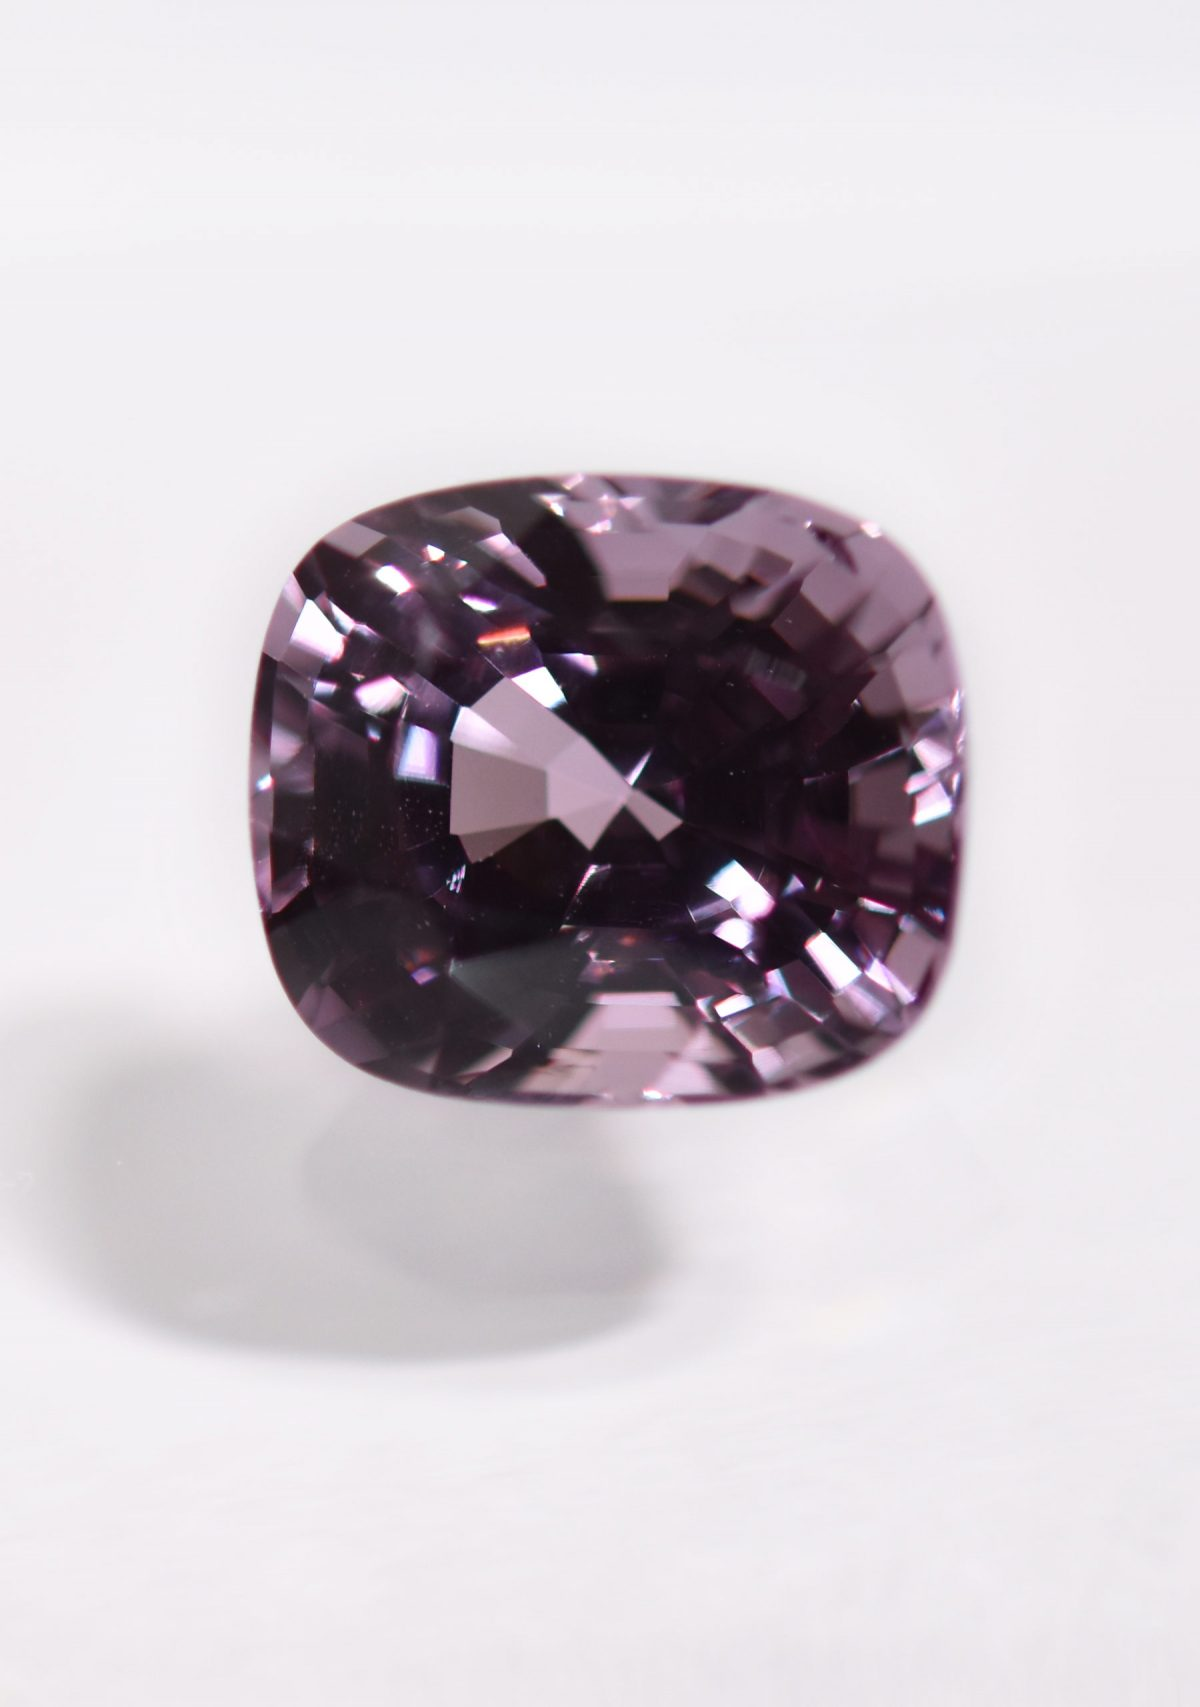 Pink Spinel Gemstone for Custom Engagement Ring